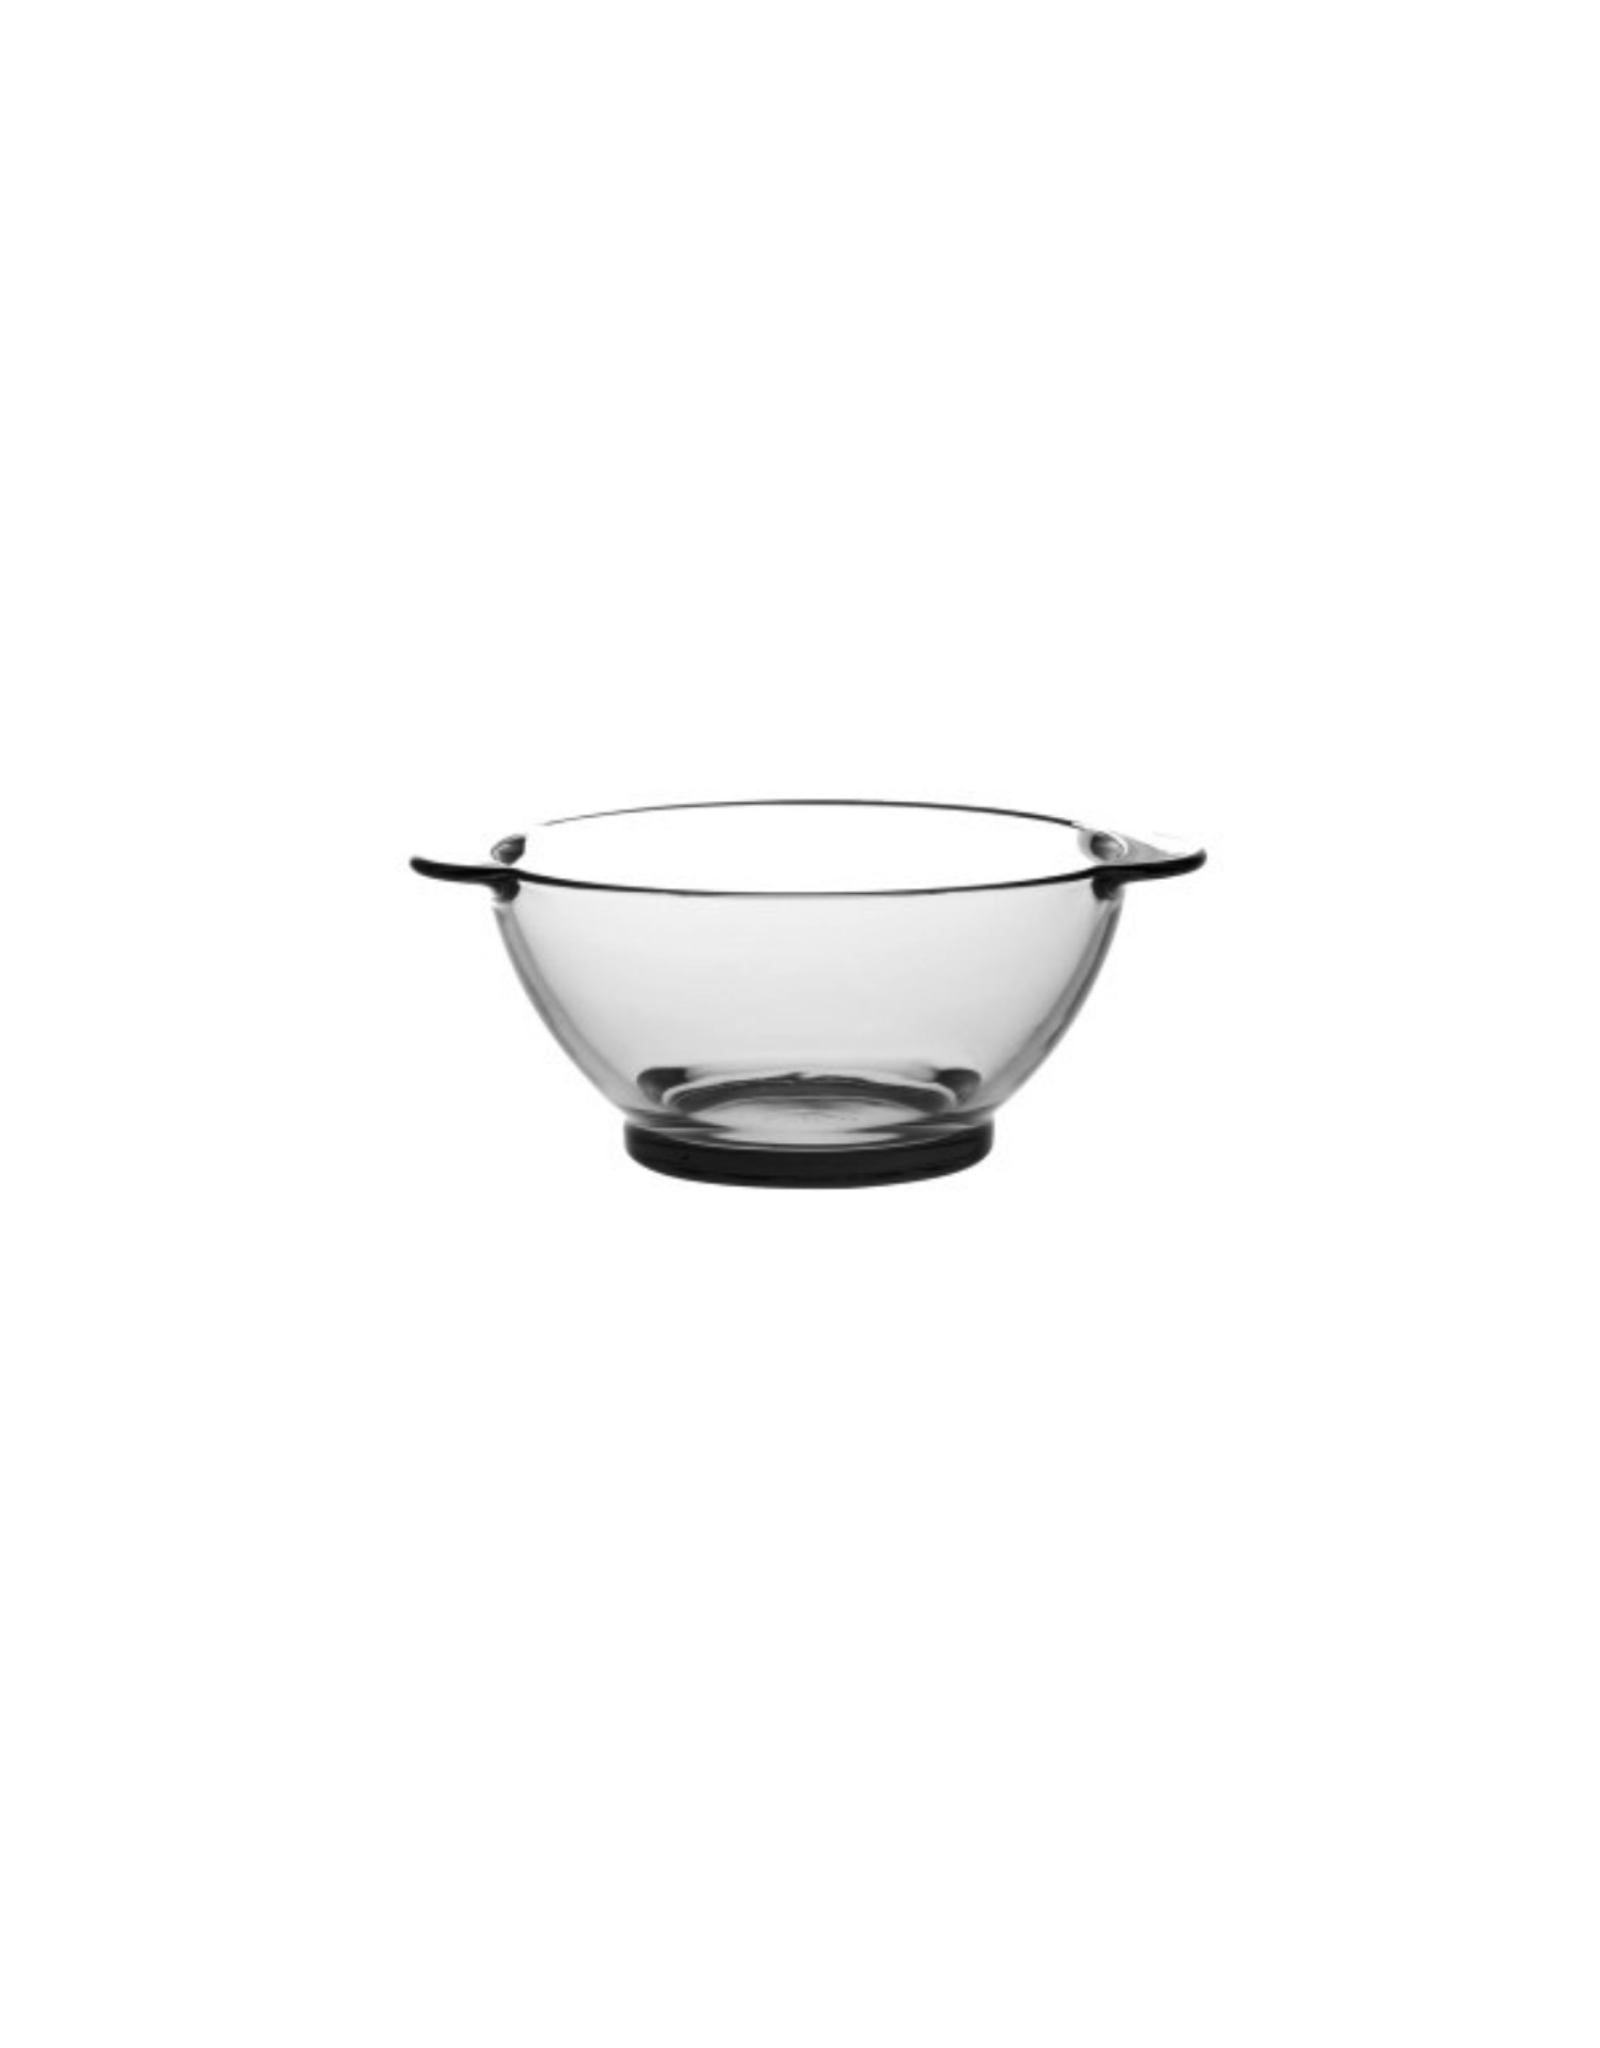 ICM Bowl earred 510mL LYS FRANCE